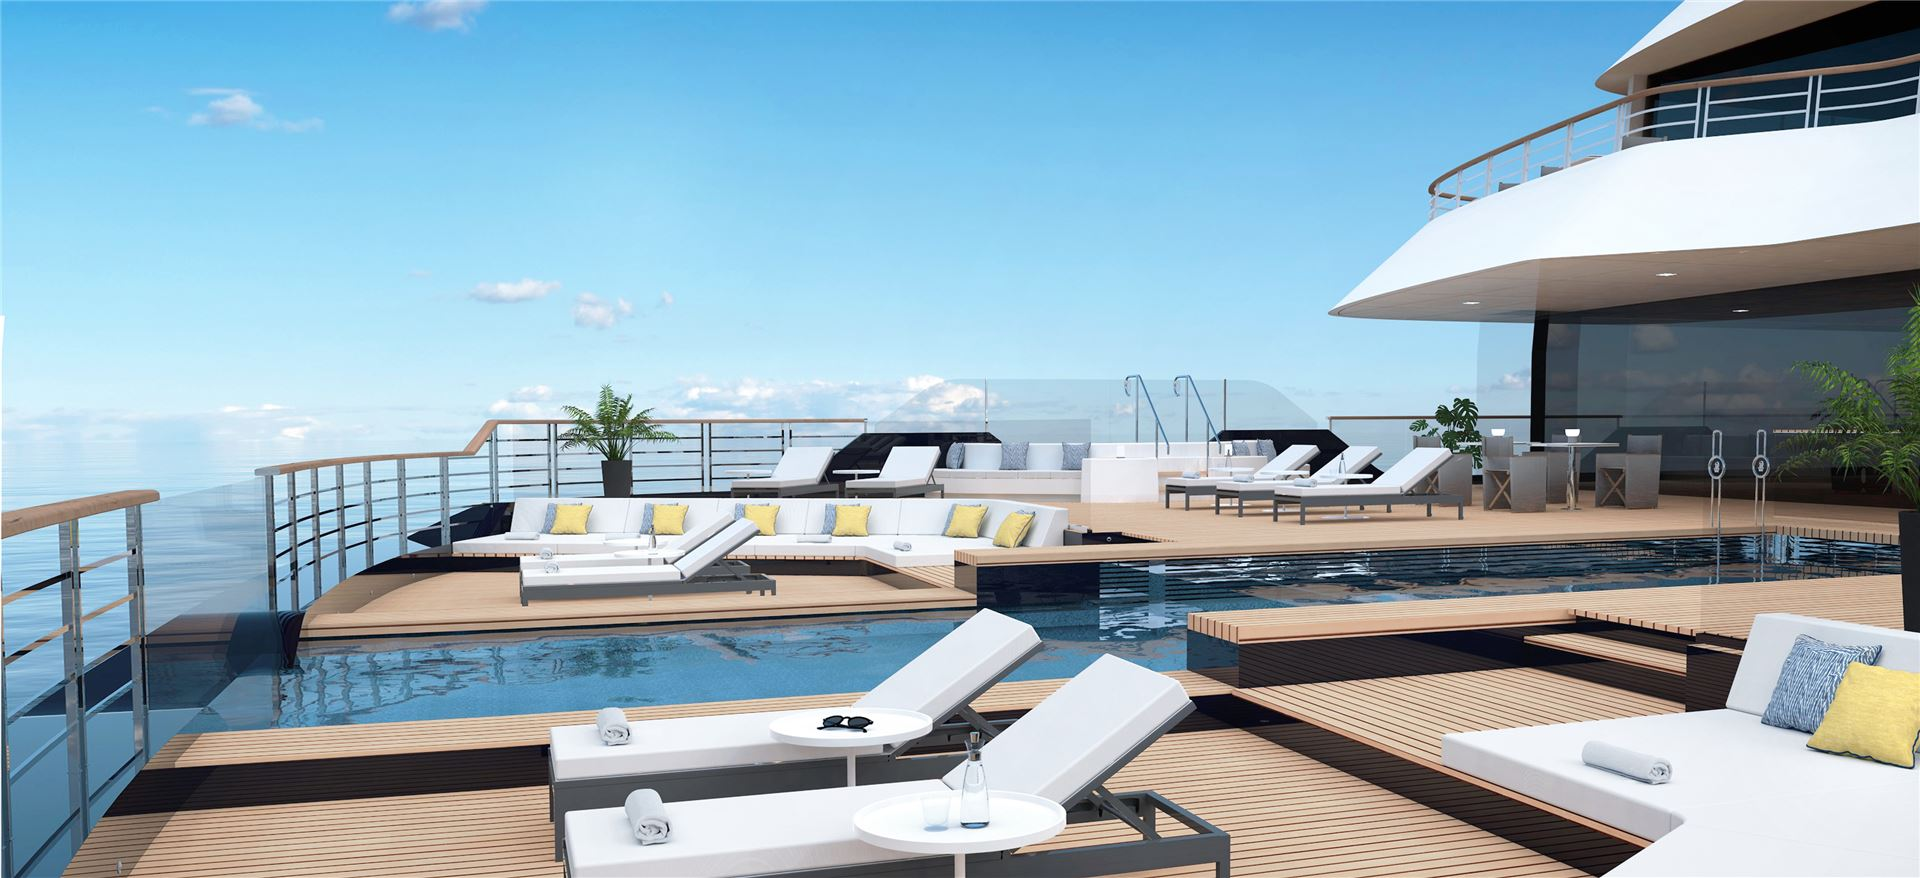 Ritz Carlton Yacht Aft main pool deck.